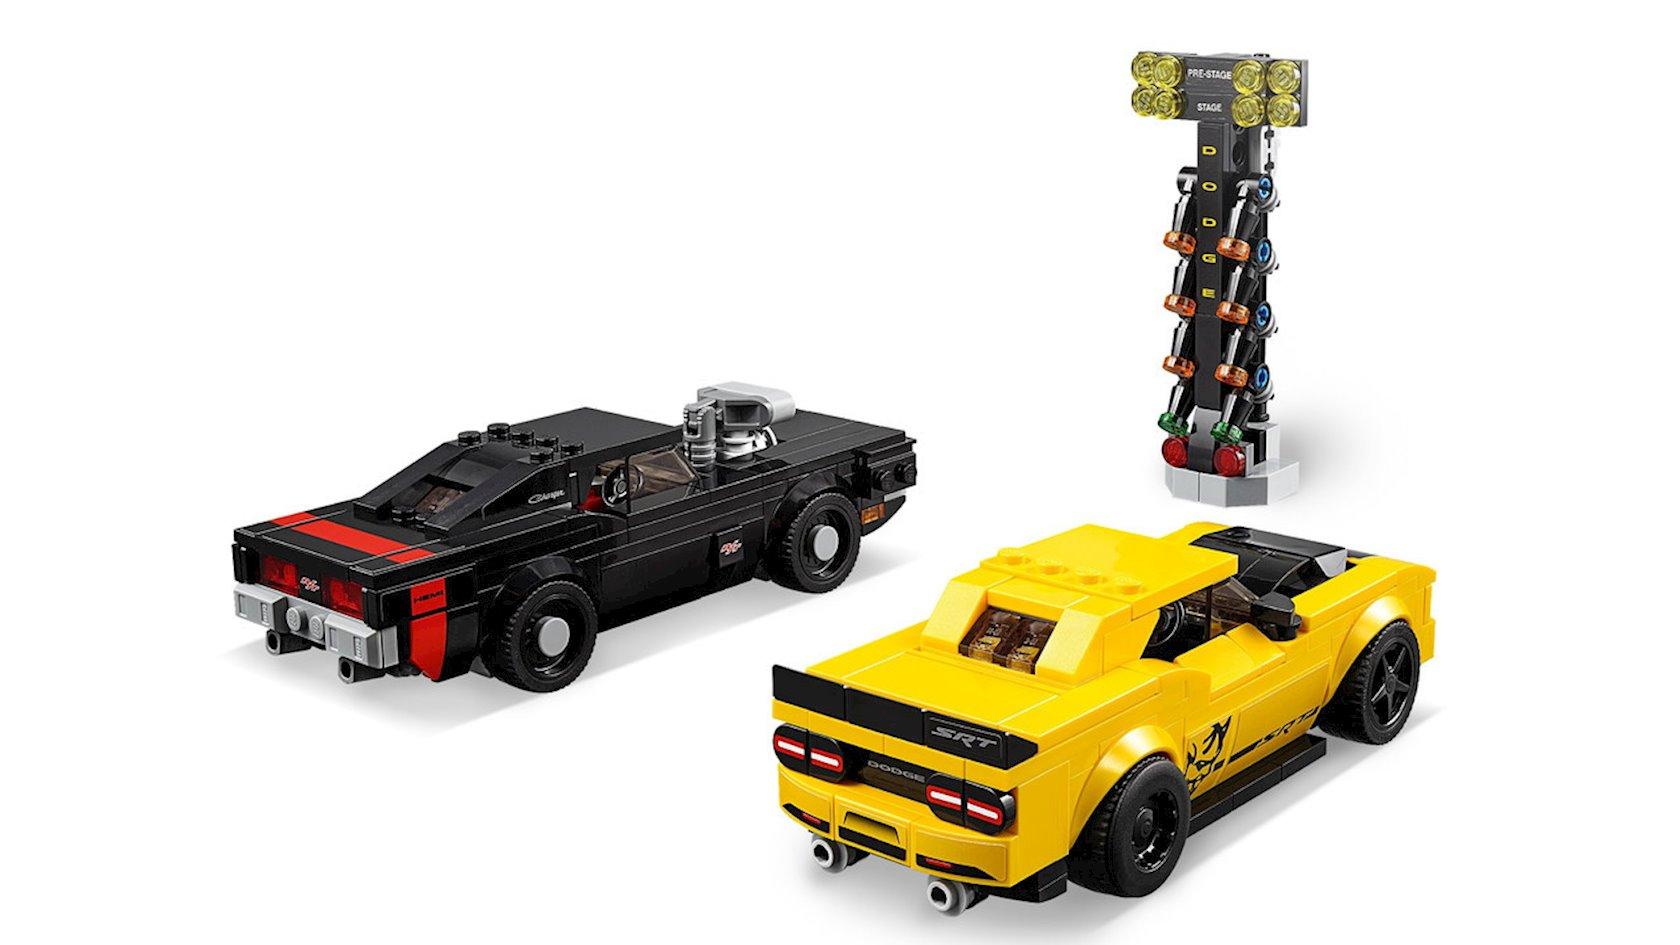 Konstruktor Lego Speed Champions Avtomobillər Dodge Challenger SRT Demon 2018 и Dodge Charger R/T 1970